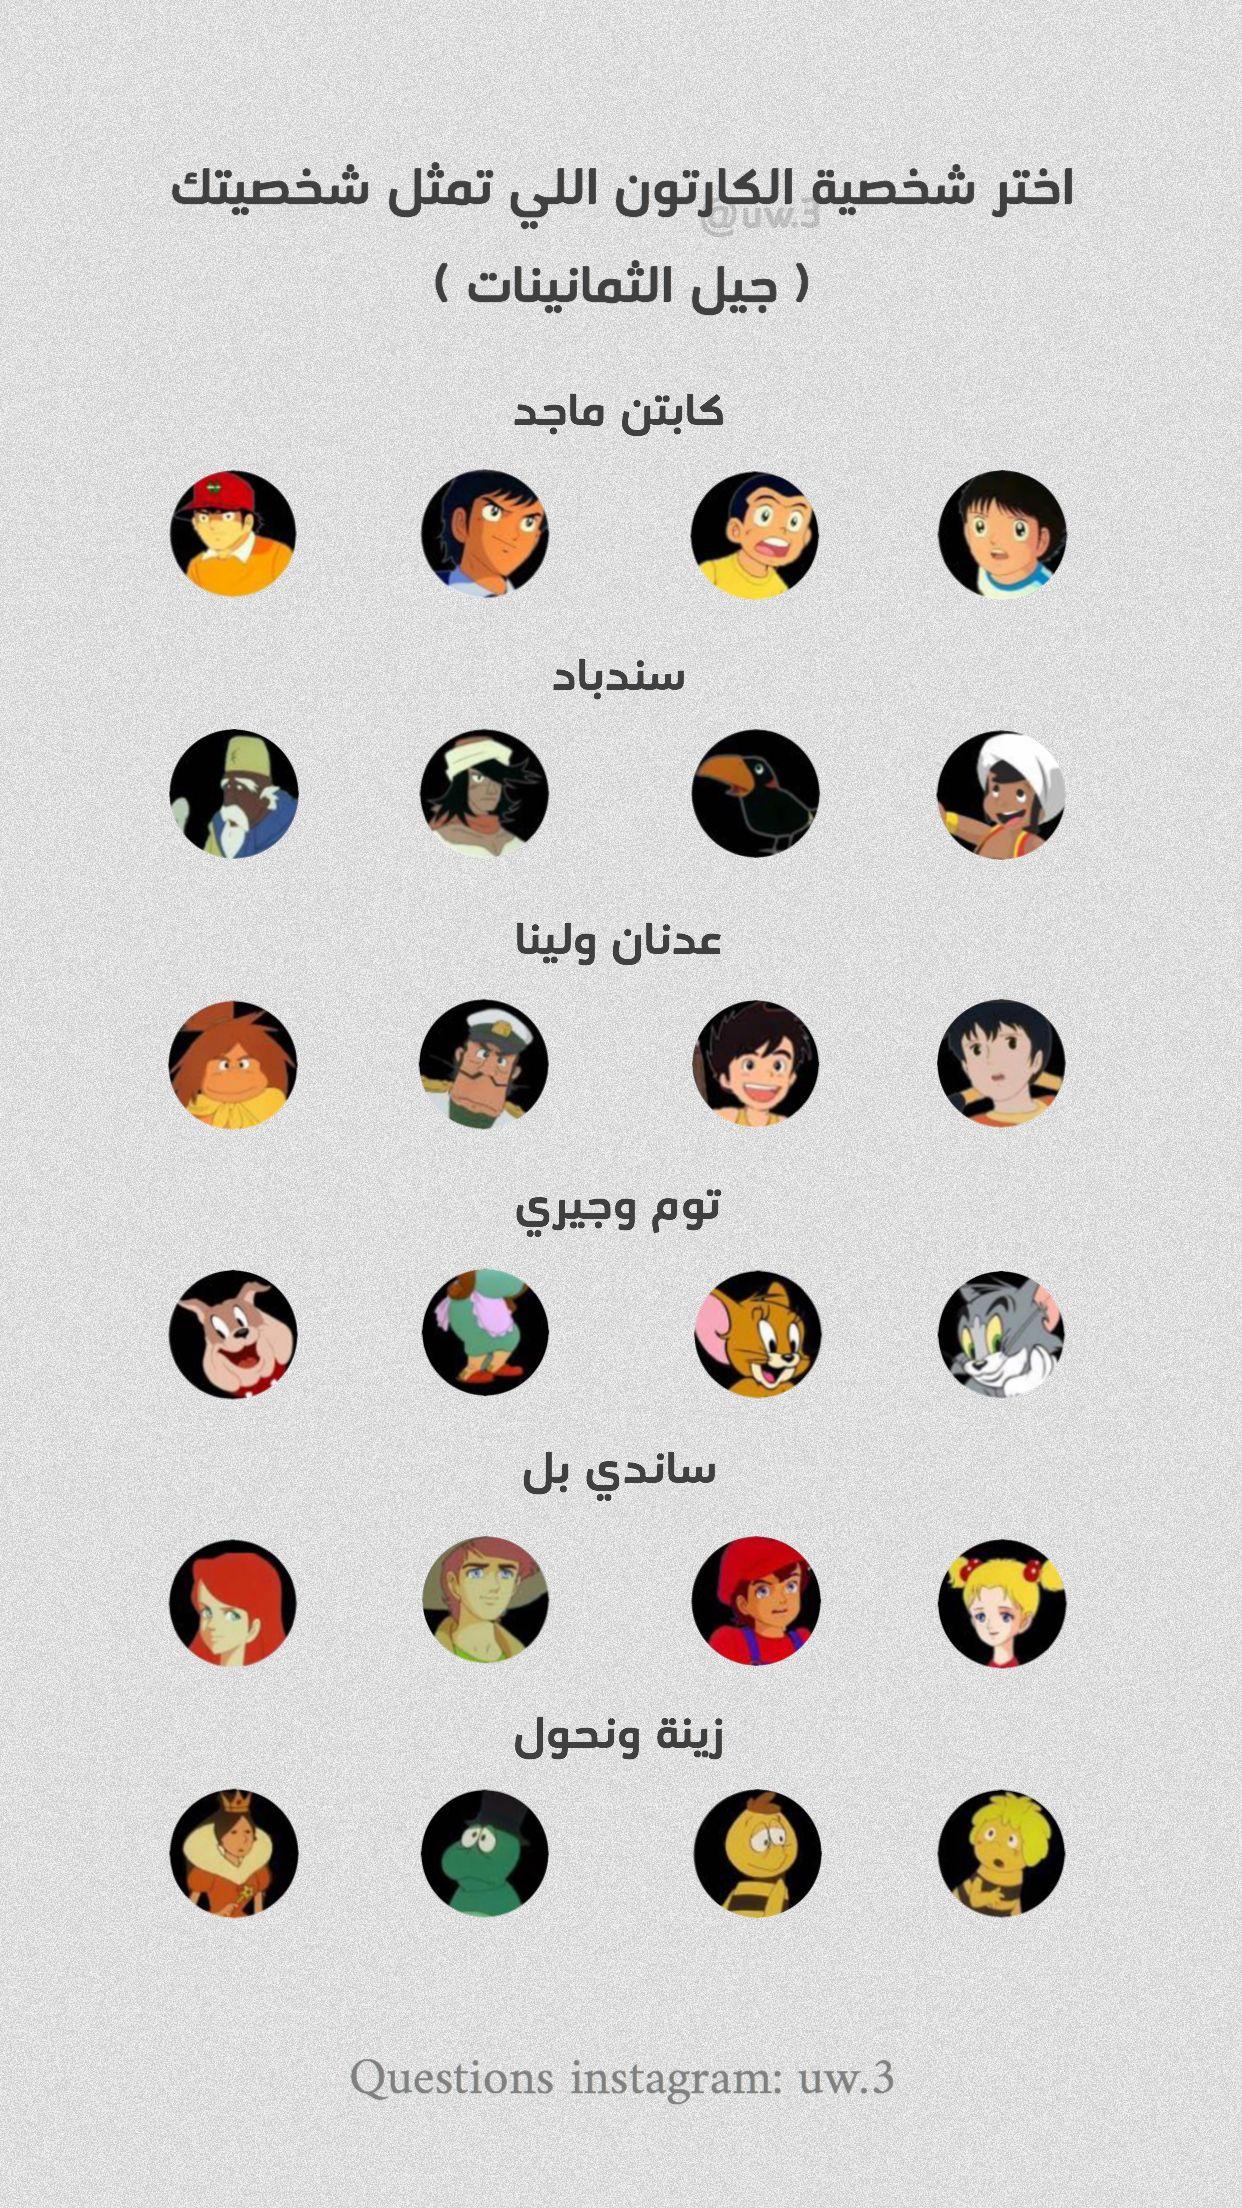 اسئلة ستوري Funny Study Quotes Funny Arabic Quotes Instagram Story Template